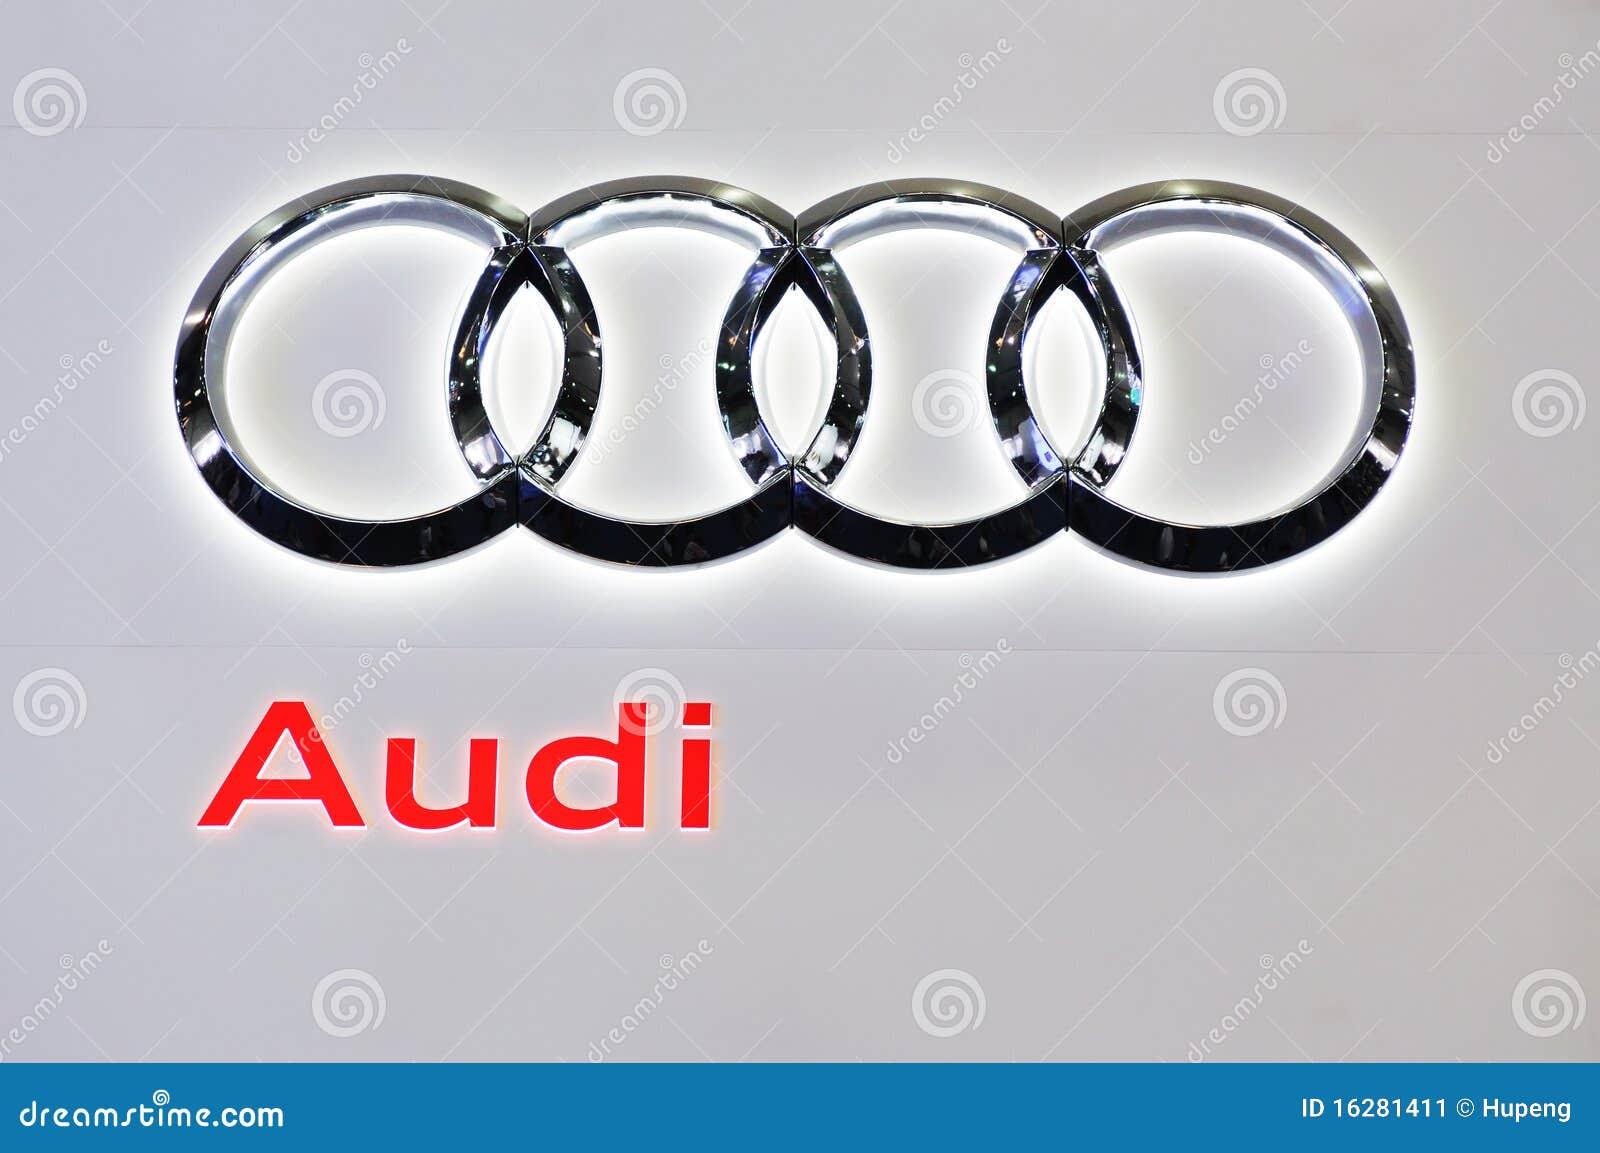 audi logo editorial photo image of modern luxury cars